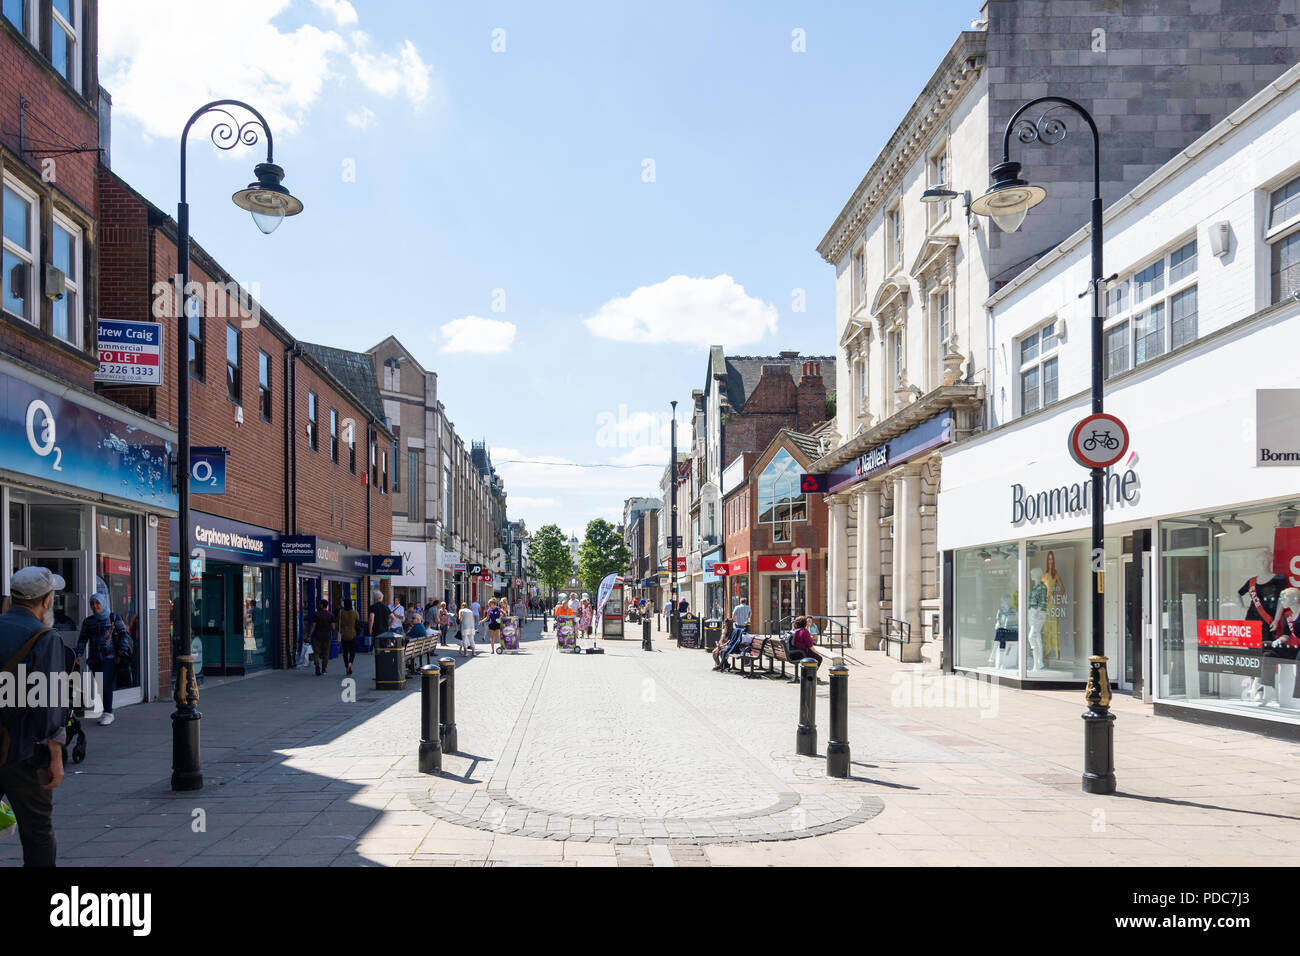 Pedestrianised King Street, South Shields, Tyne and Wear, England, United Kingdom - Stock Image